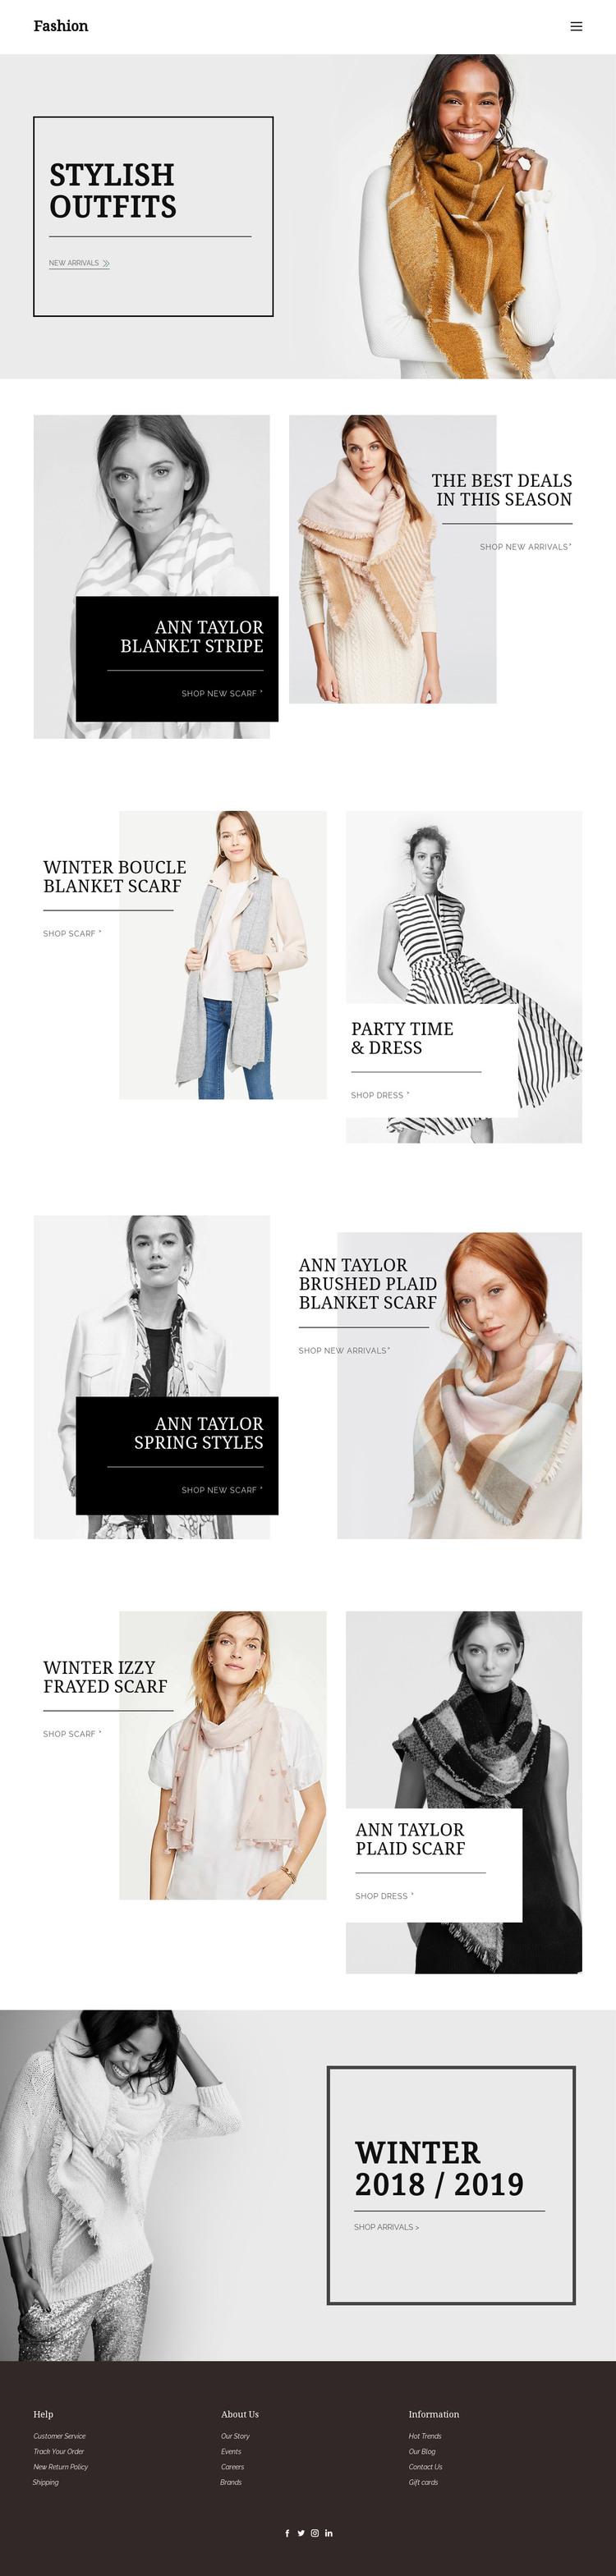 Personal shopper service HTML Template